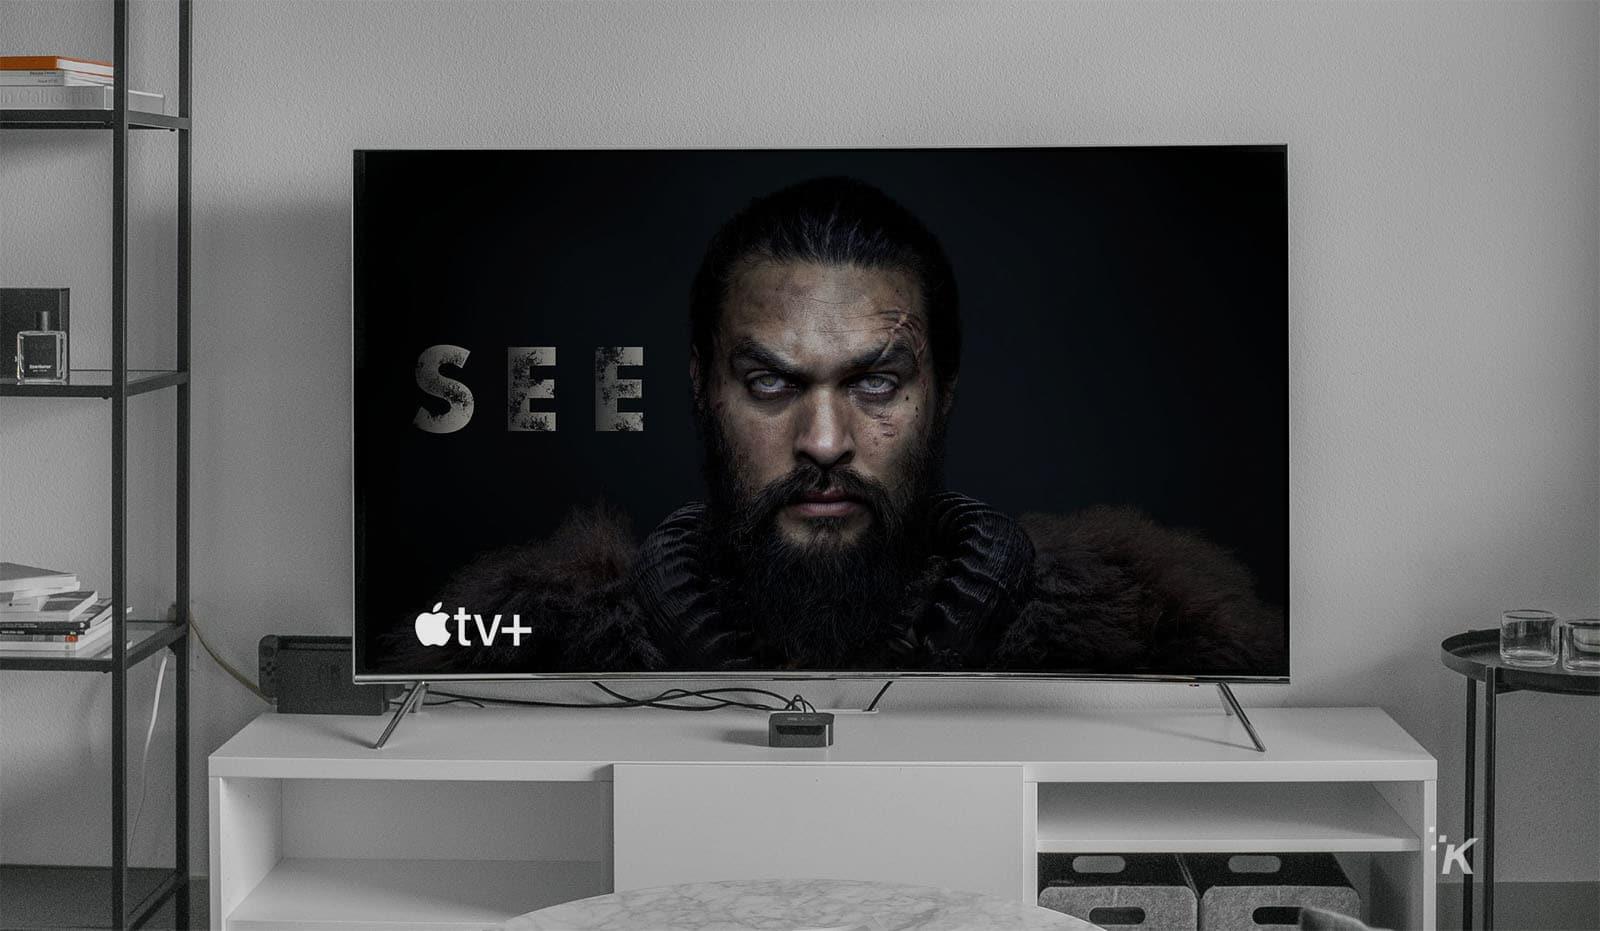 apple tv+ on tv